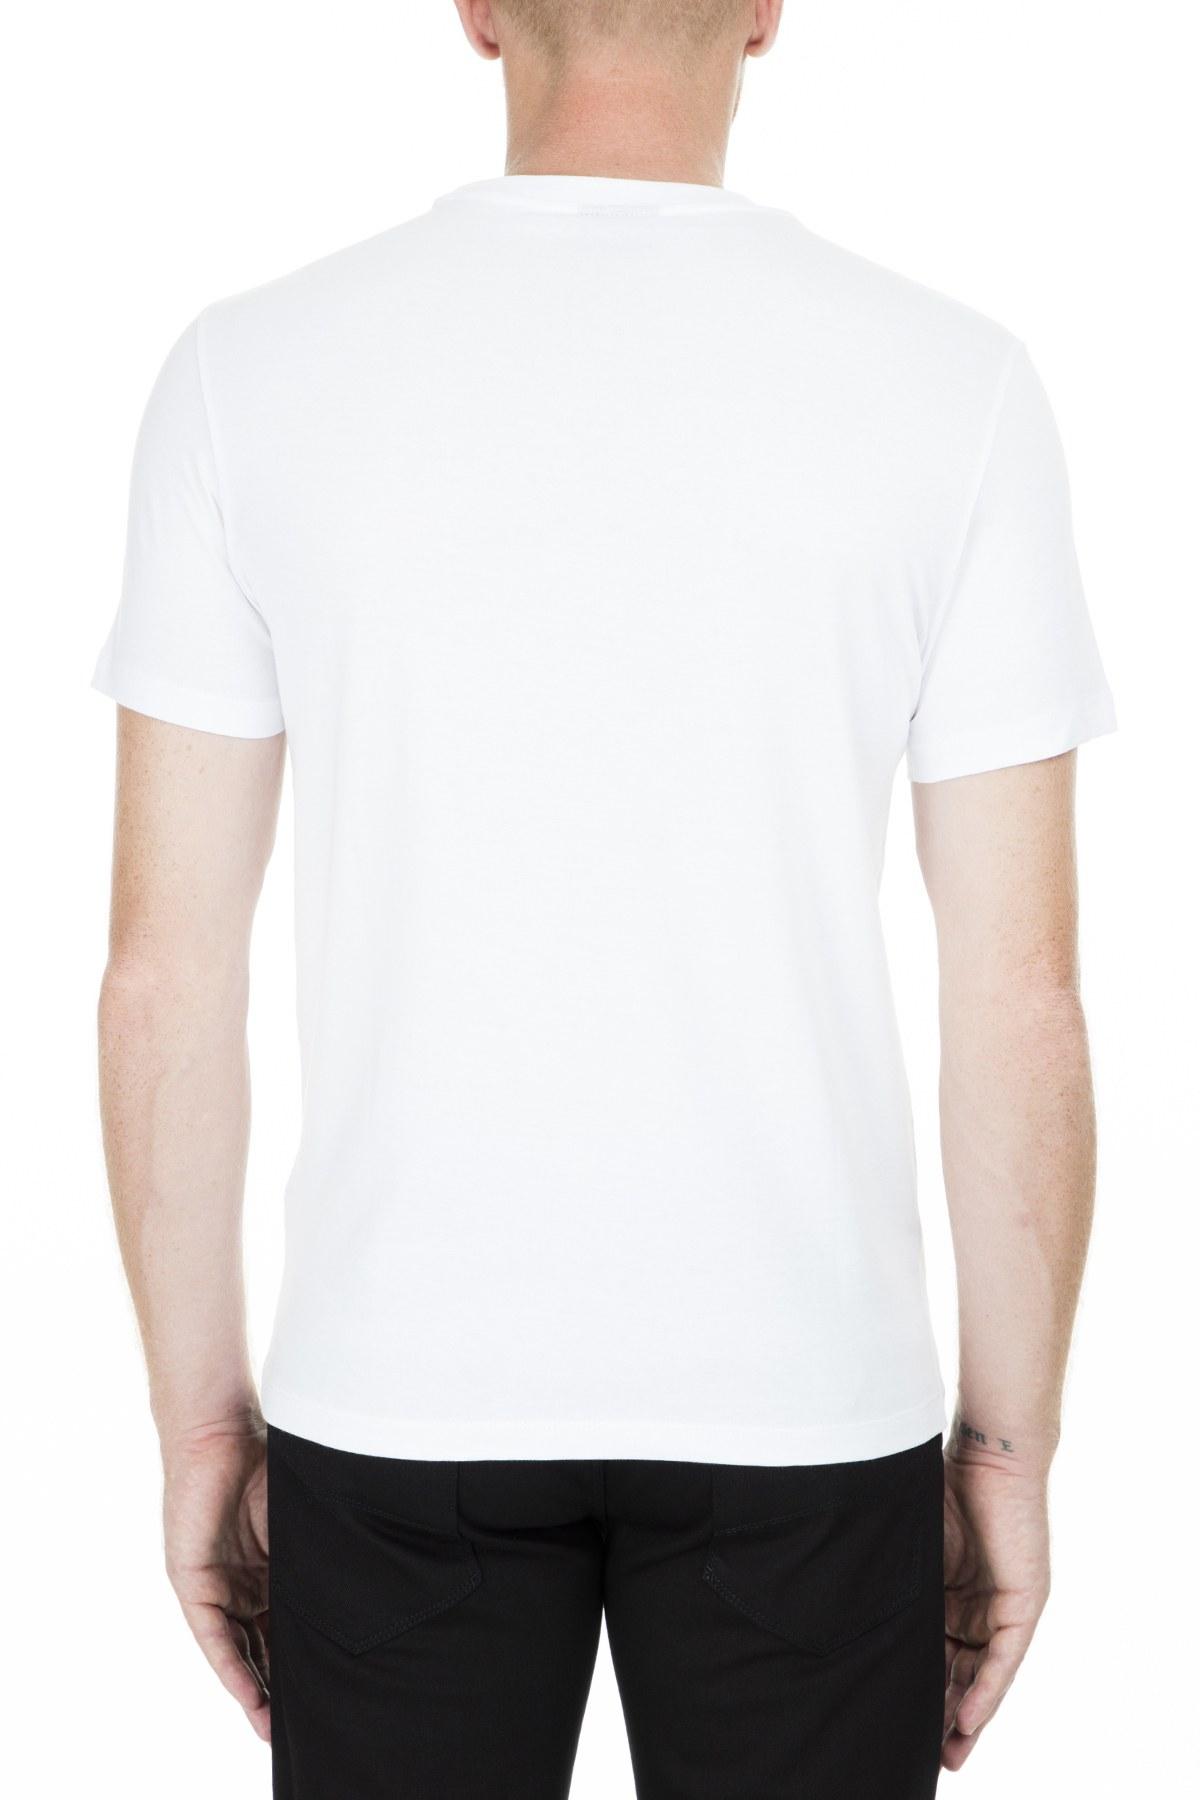 Emporio Armani Erkek T Shirt S 3G1TG1 1J00Z 0137 BEYAZ